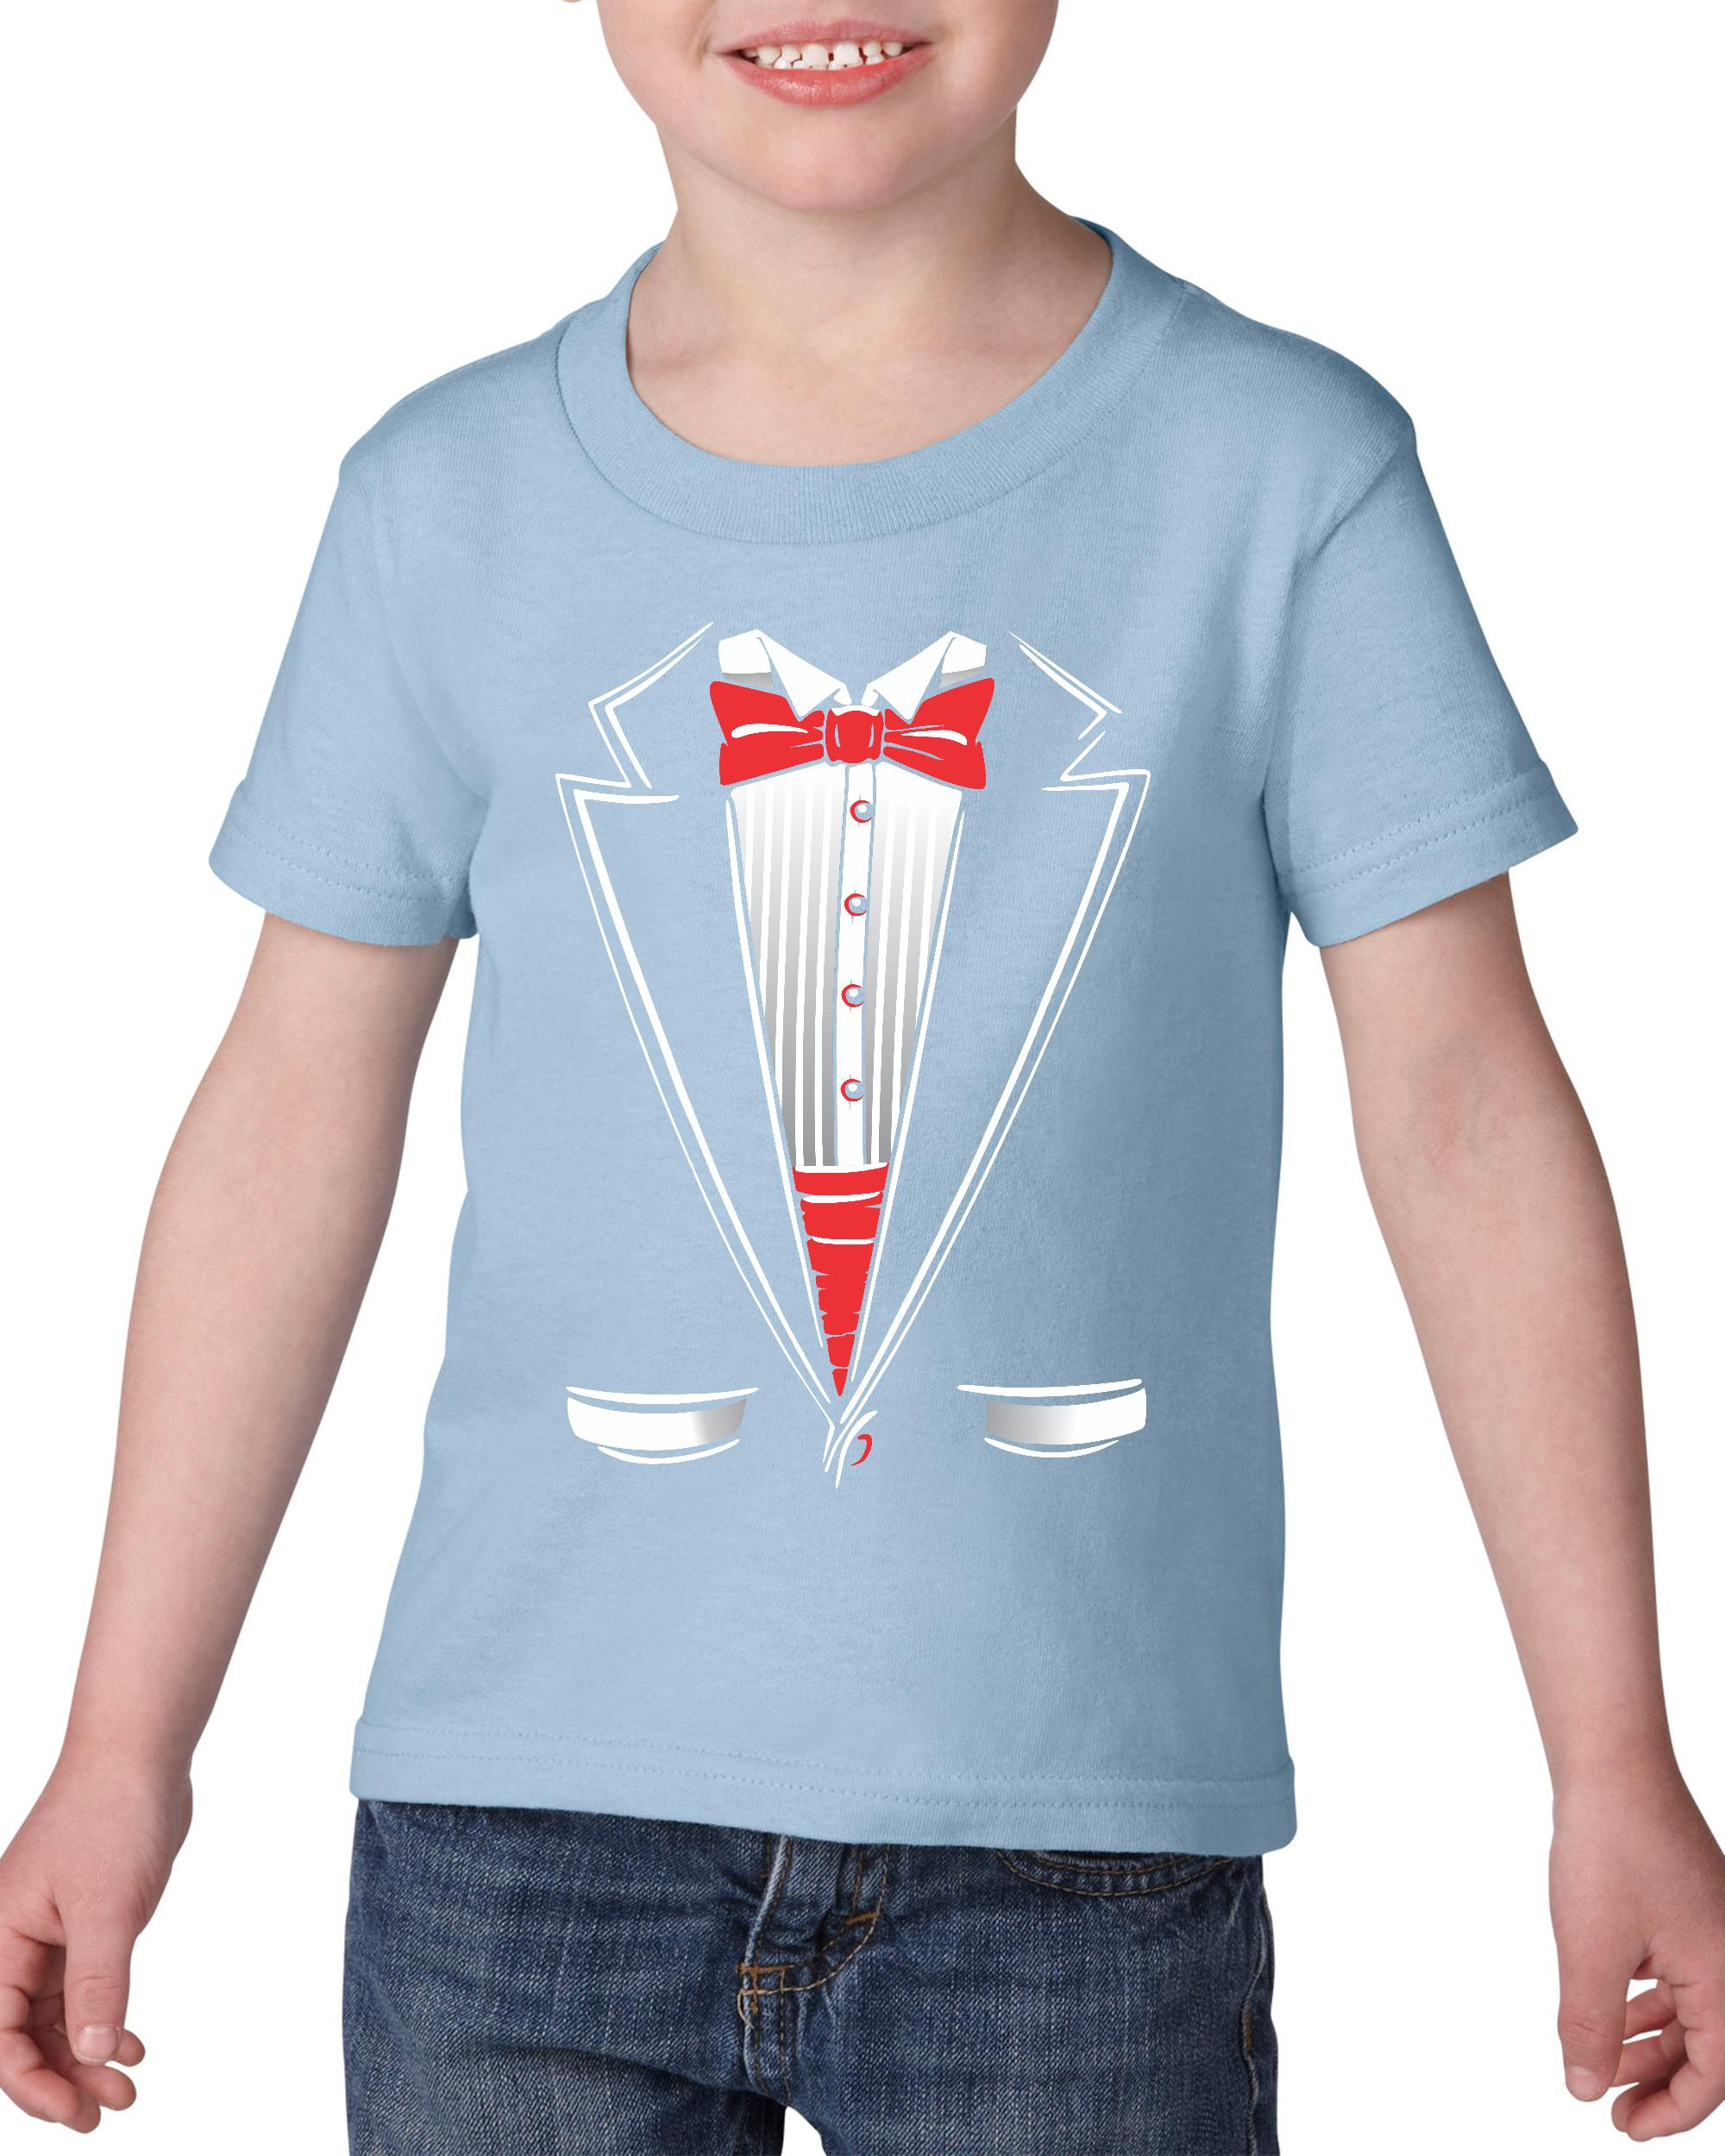 Artix Tuxedo Prom Costume Graduation Birthday Christmas Prom Party Gift Heavy Cotton Toddler Kids T-Shirt Tee Clothing